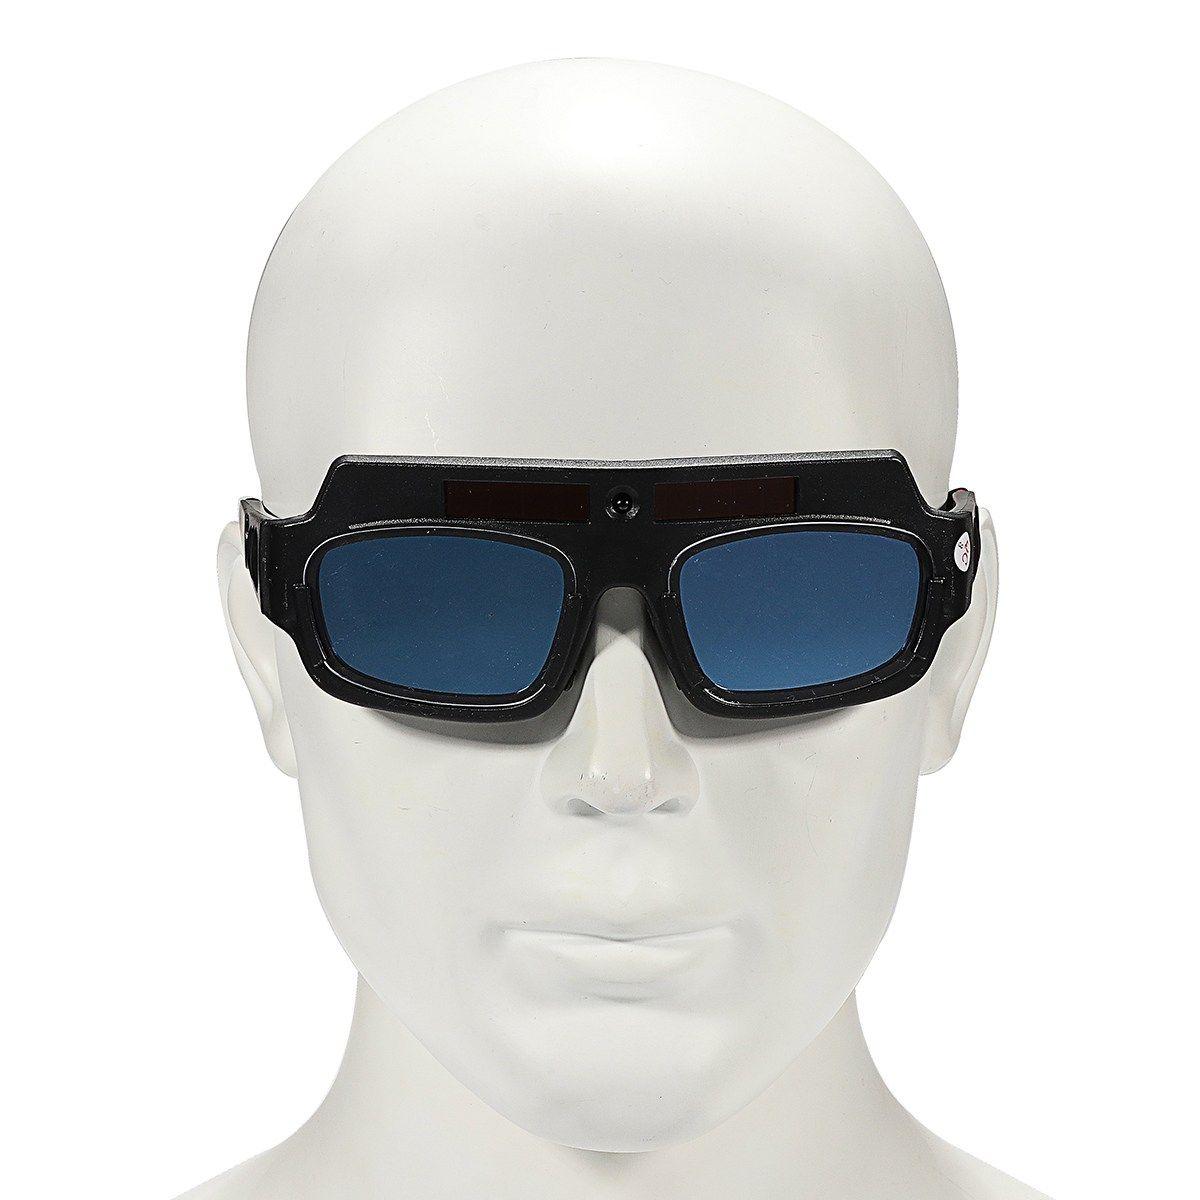 NEW Safurance Solar Auto Darkening Welding Mask Helmet Eyes Goggle Welding Glasses Workplace Safety Eye Protection